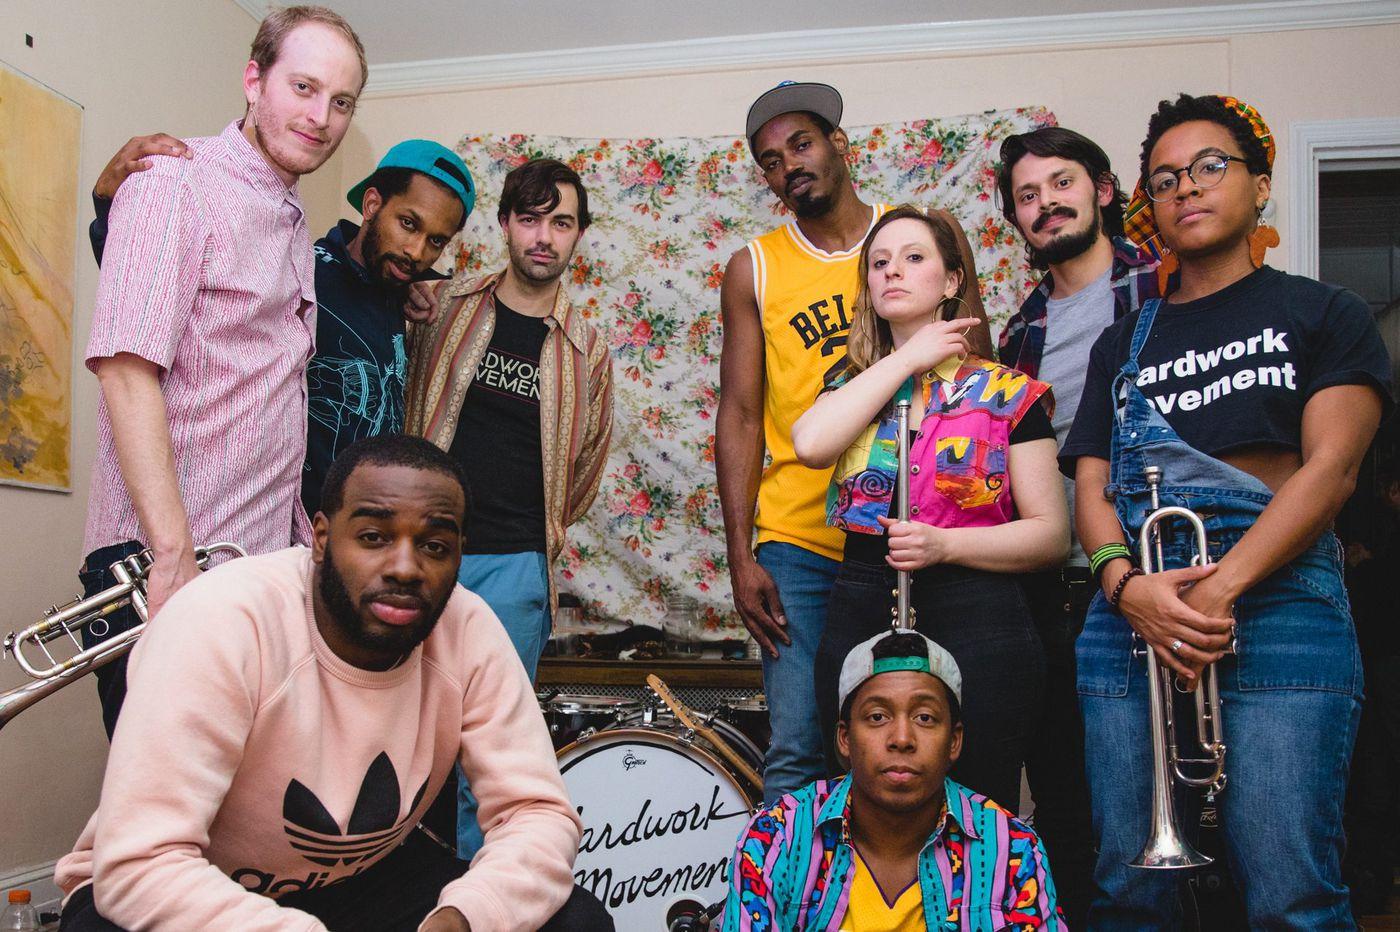 Dan DeLuca's Mix Picks: Tacocat, Yemen Blues, and Hardwork Movement's 'Summer Vibes'